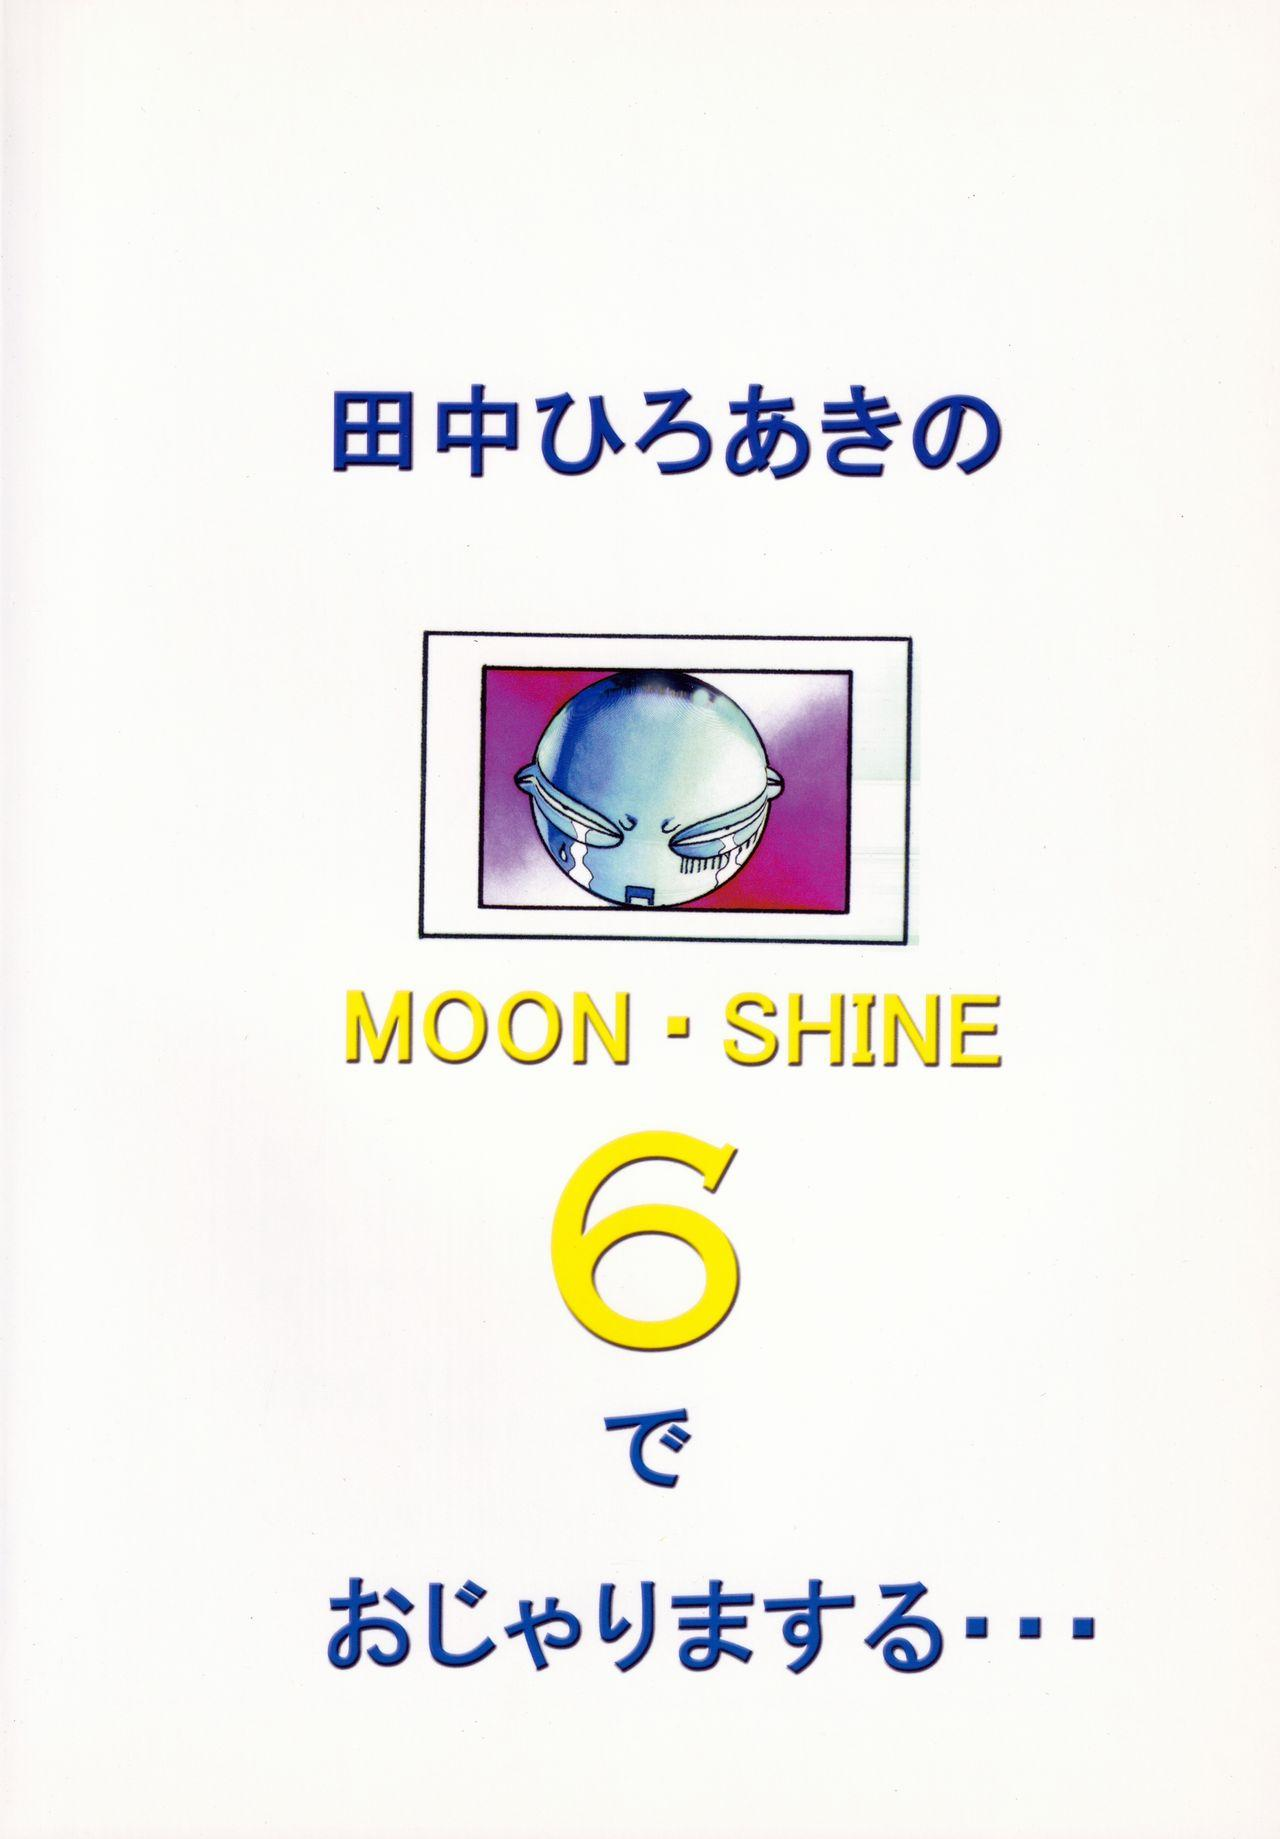 MooN Shine 6 37